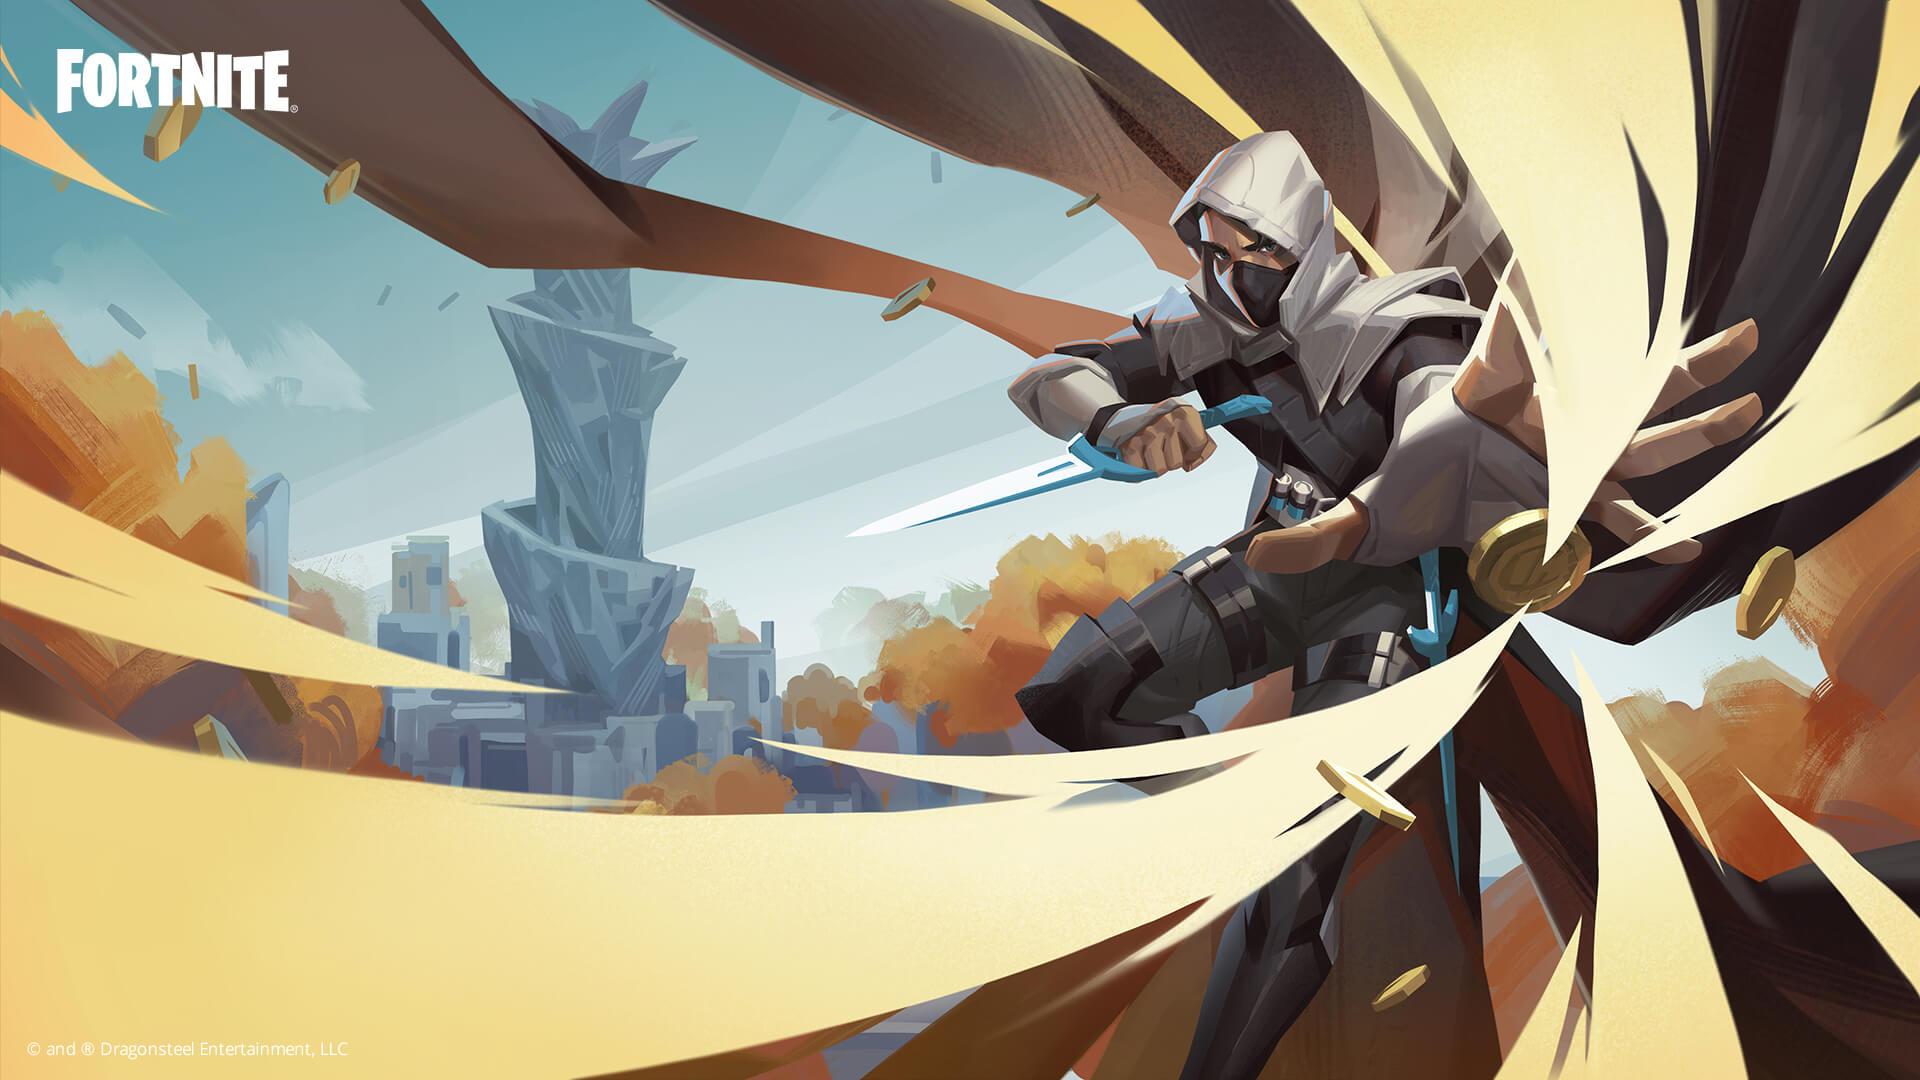 Fortnite A New Shardworld? Loading Screen